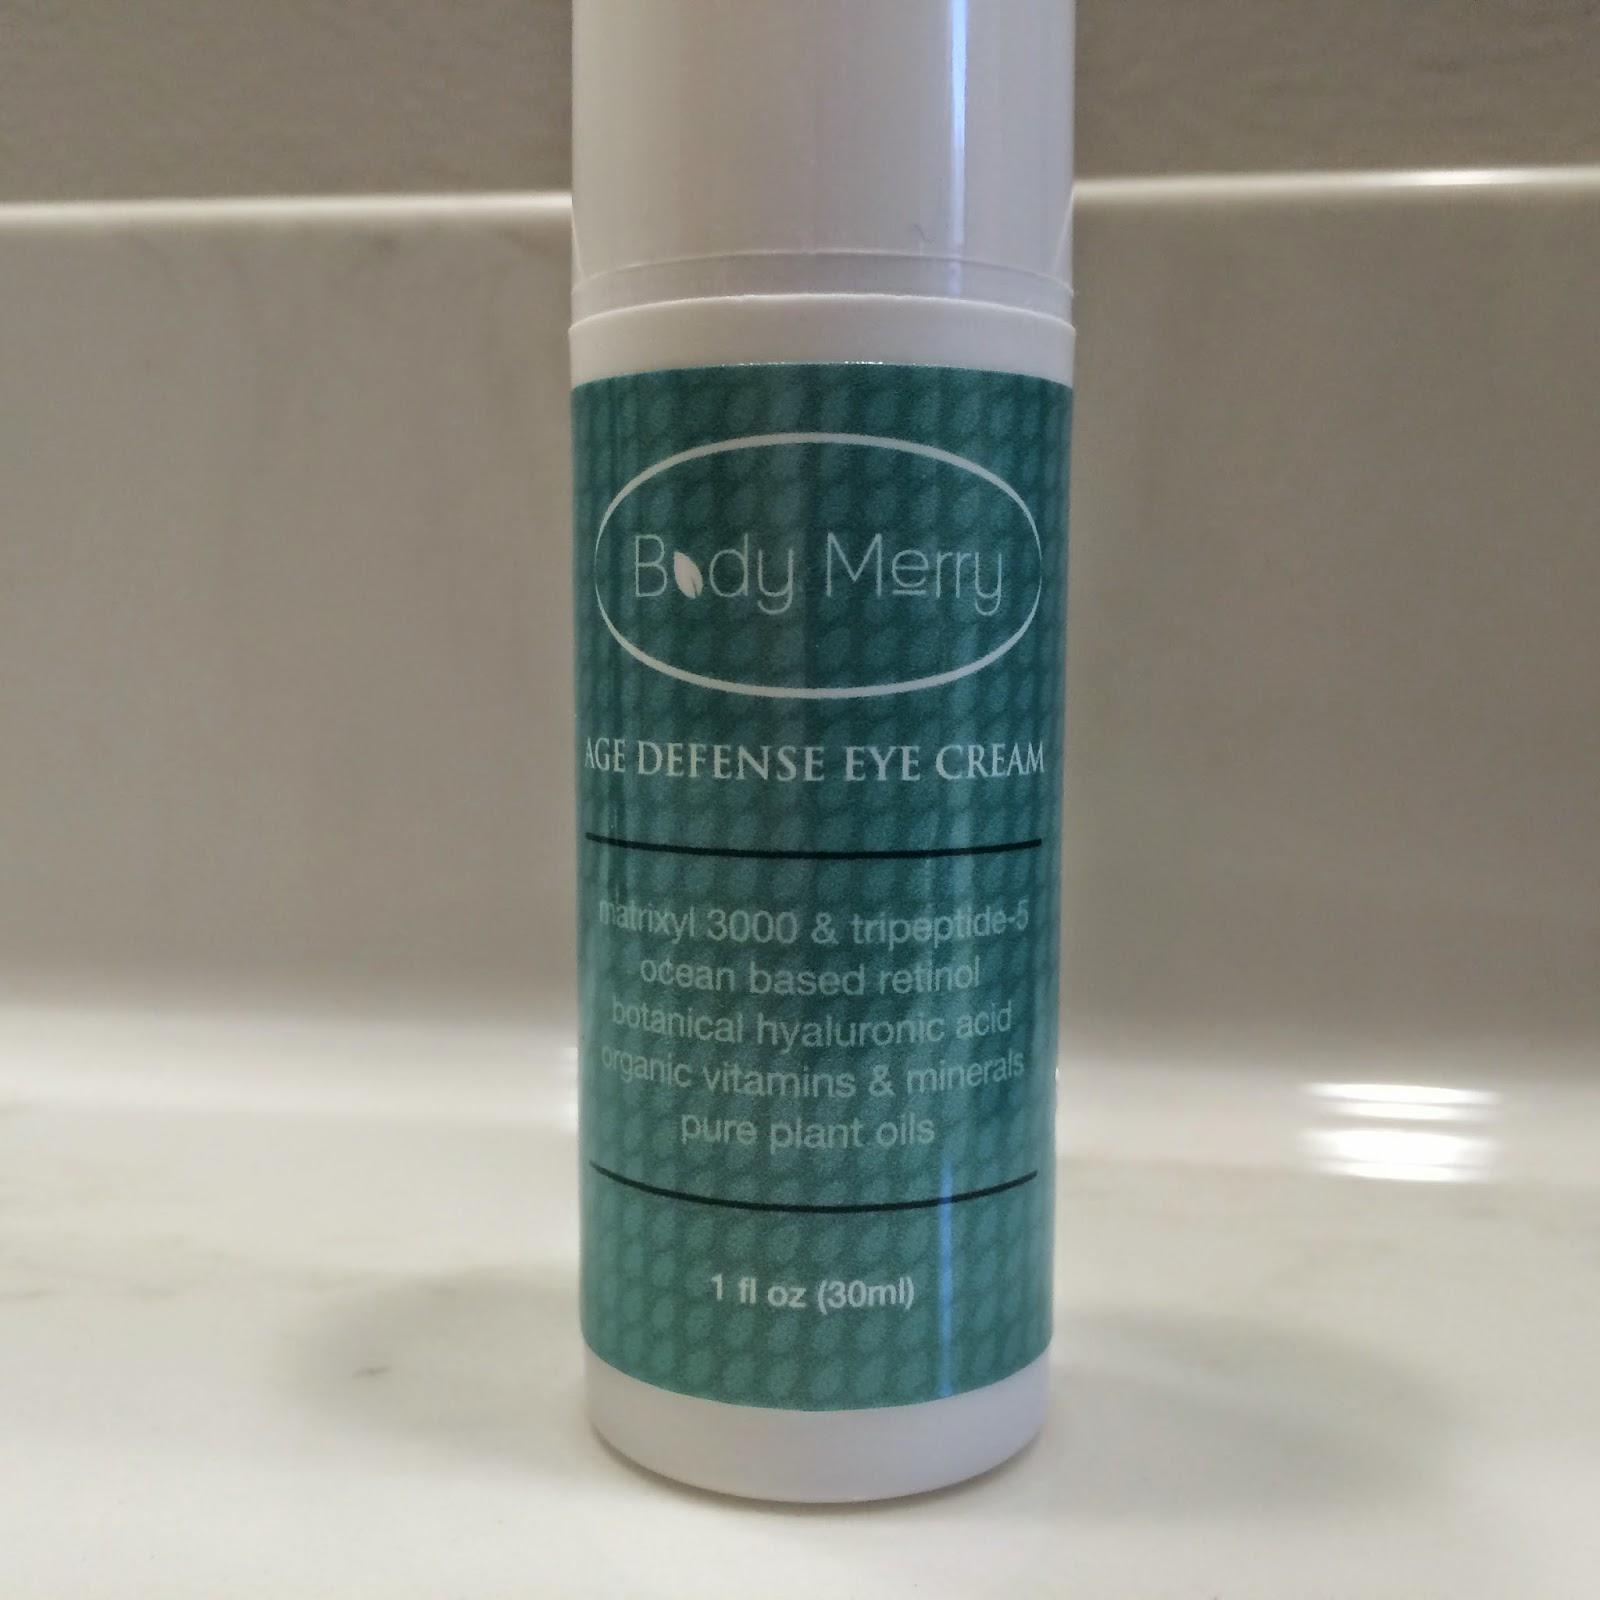 Body Merry Age Defense Eye Cream #review #ivysvariety